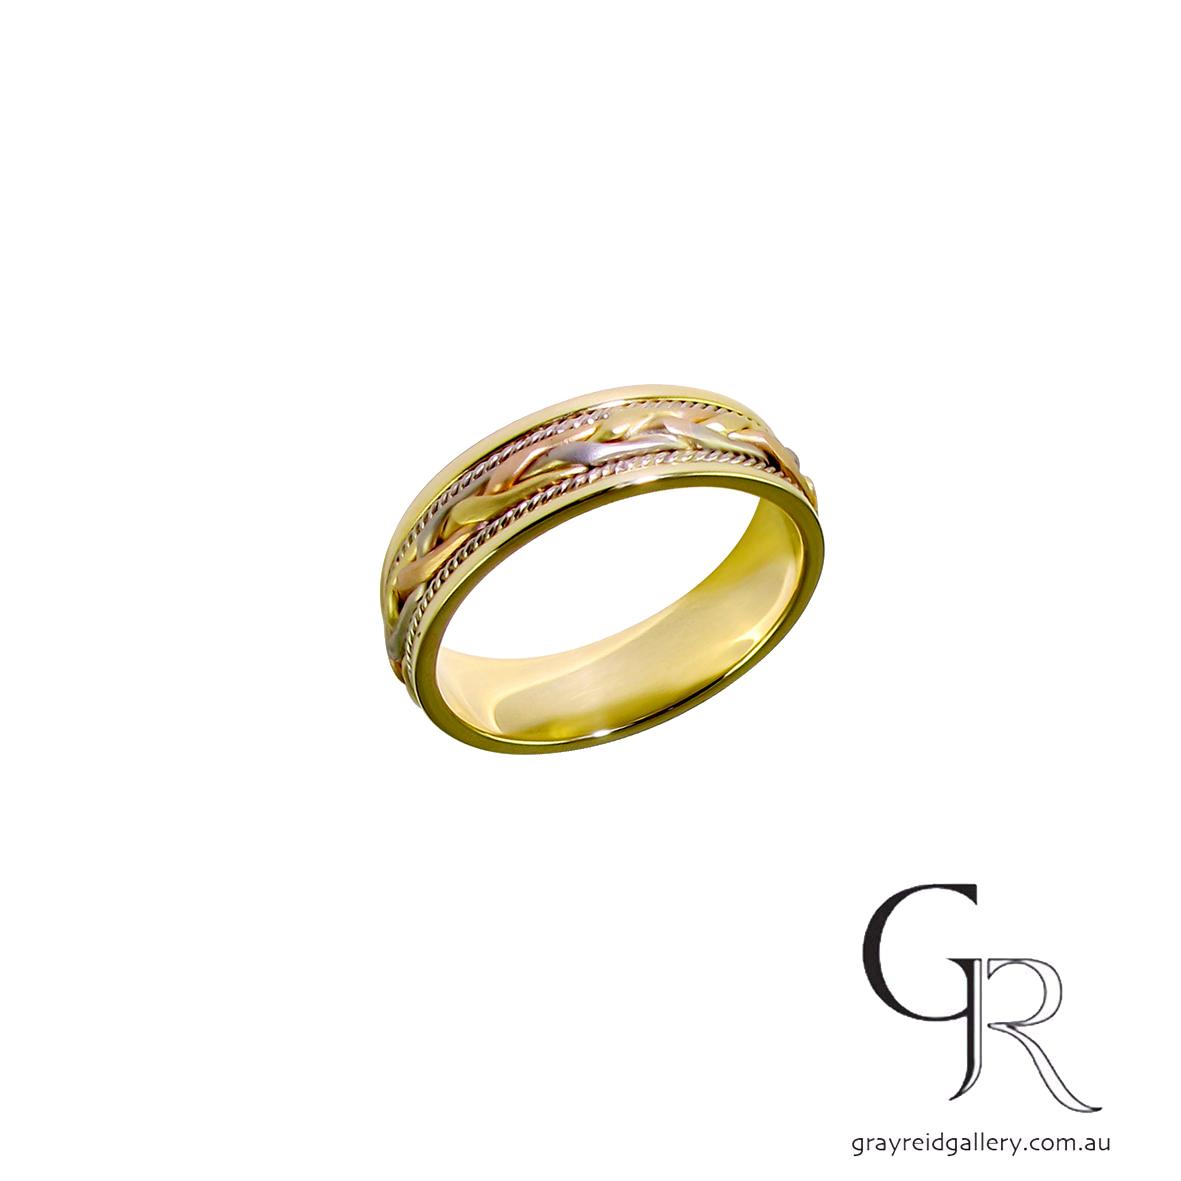 Wedding bands Melbourne mens jewellery Gray Reid Gallery yellow gold gents ring 15.56.16.jpg